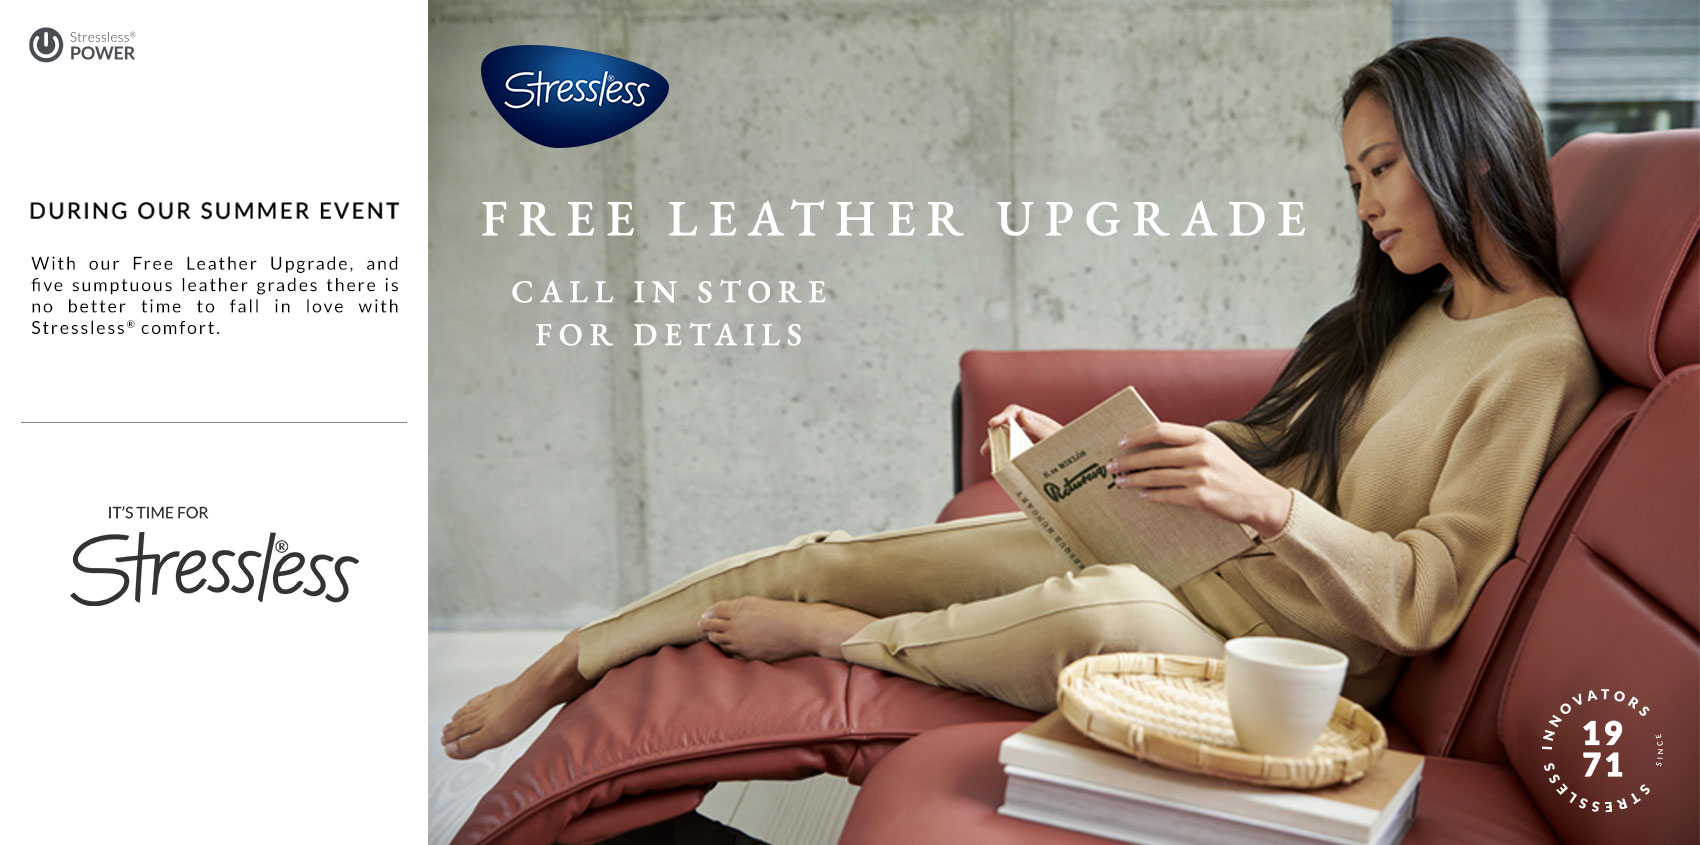 Insitu Stressless Free Leather Upgrade